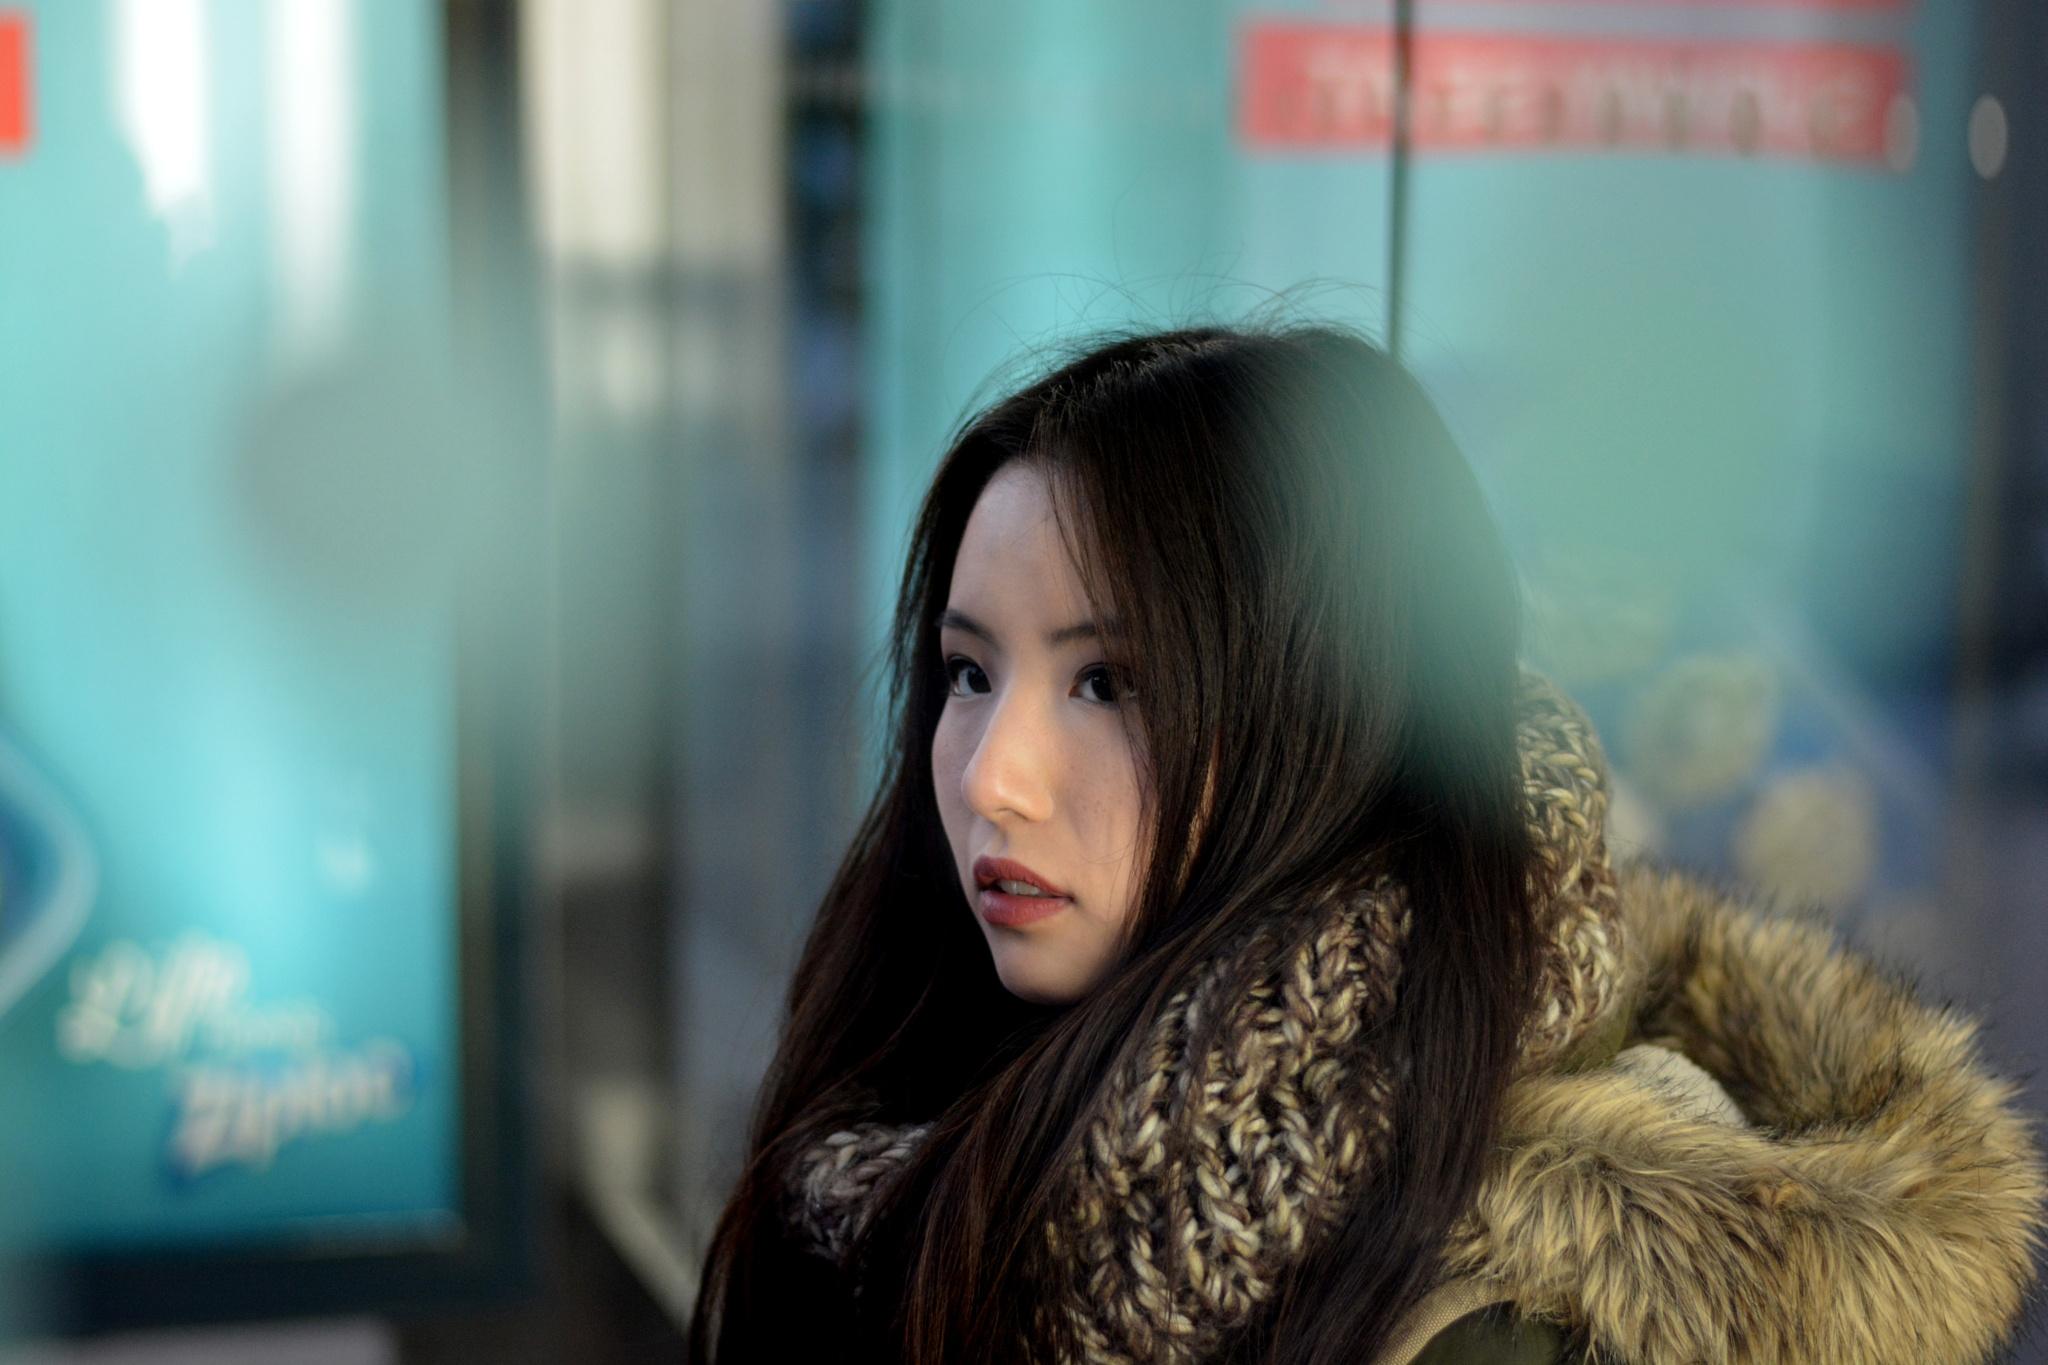 Ah..girl at bus stop by Yoko D